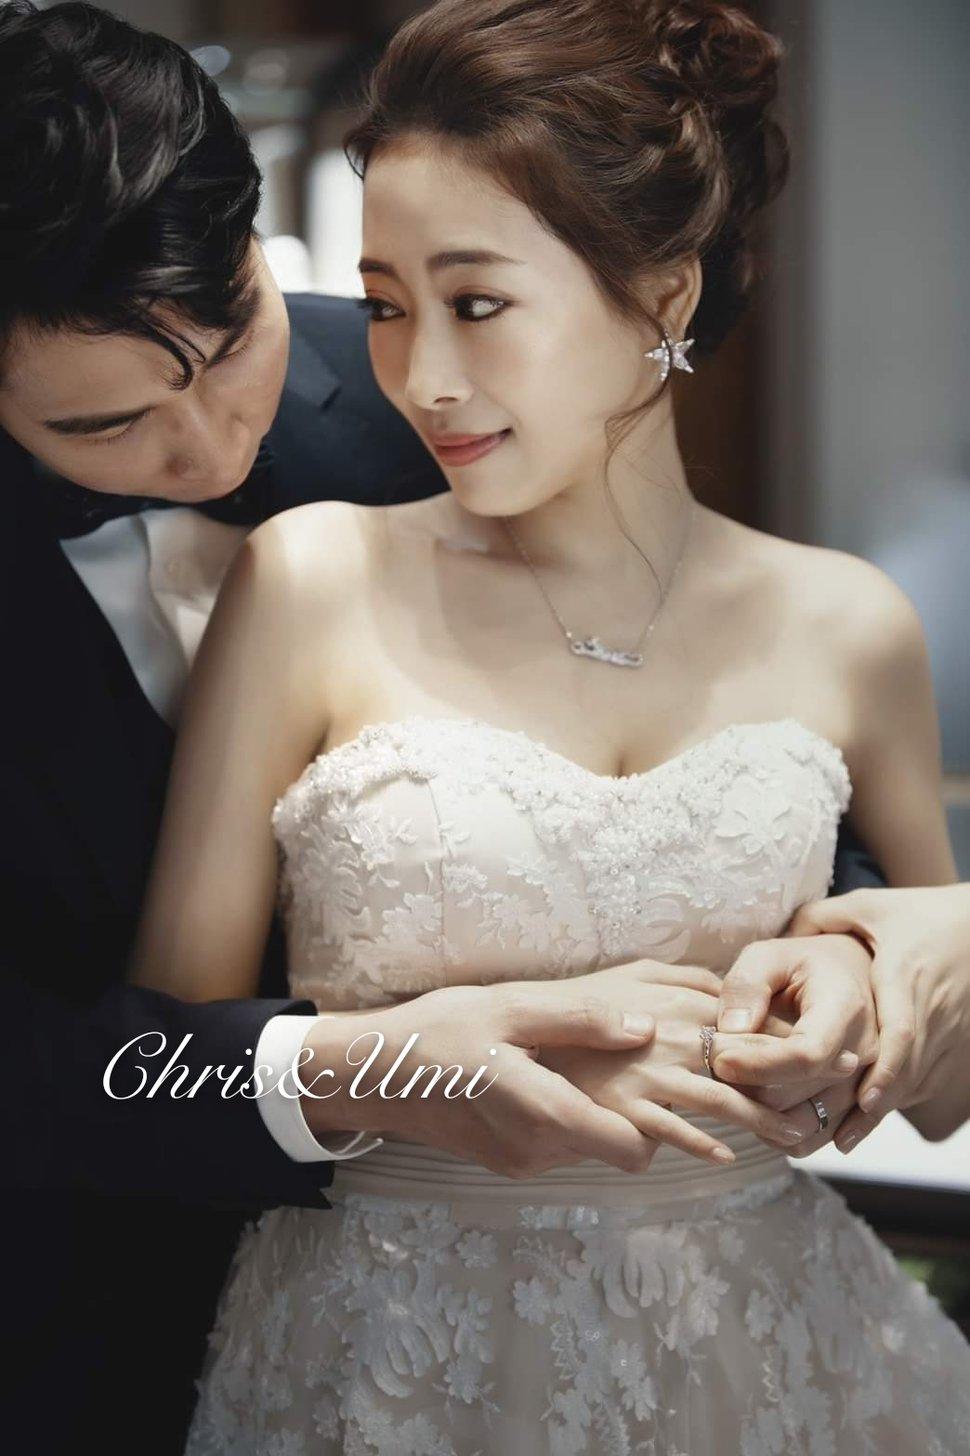 #Chris&Umi全球新秘推薦 #與古拉合作拍攝 - Chris han新娘造型《結婚吧》